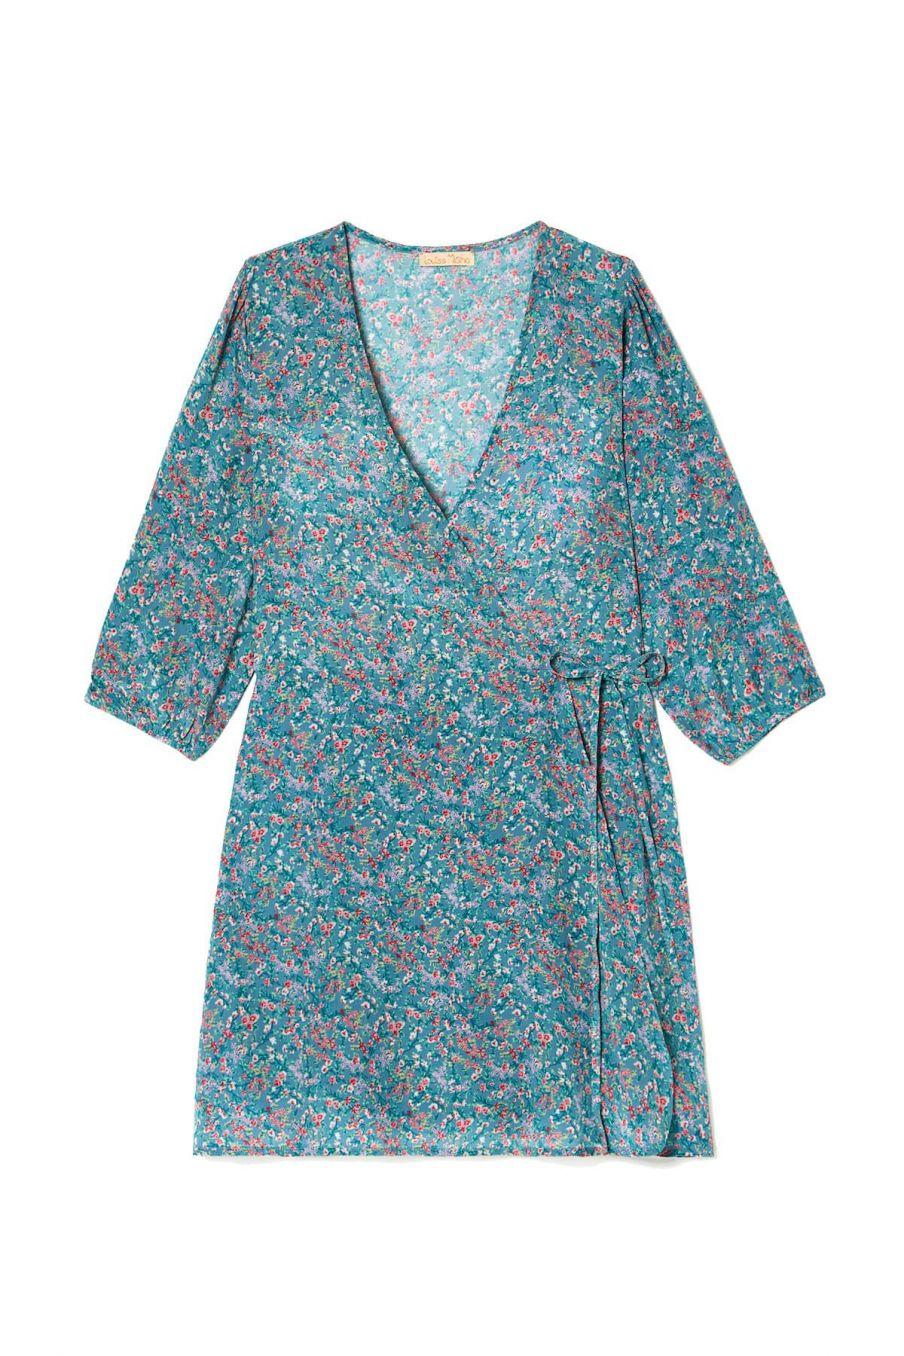 boheme chic vintage robe femme barbara storm spring flowers